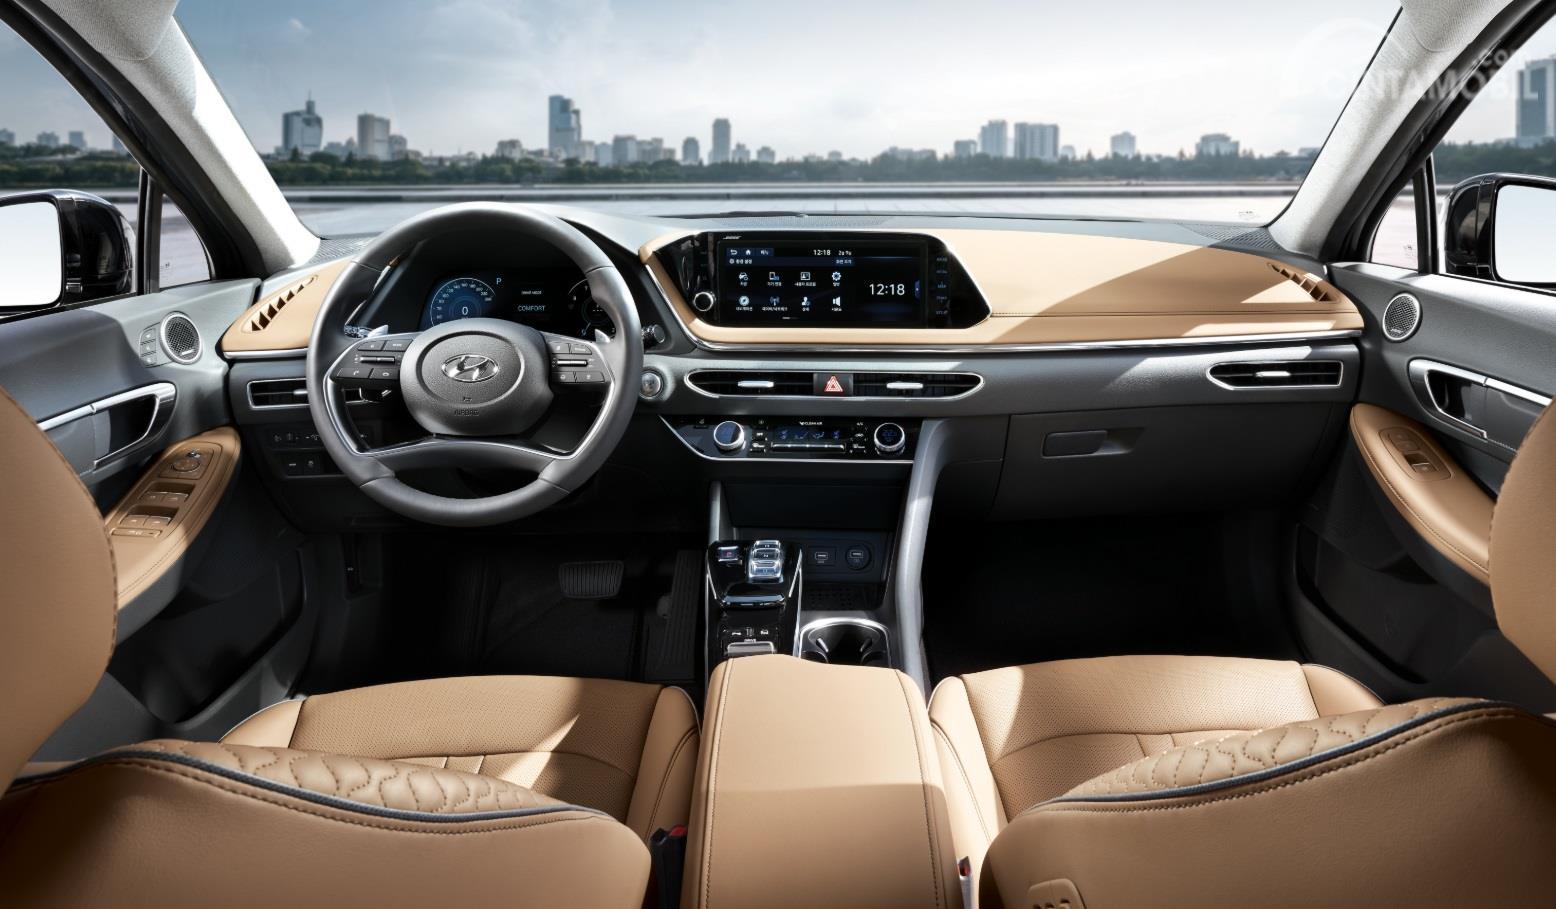 Review Hyundai Sonata 2020 Generasi Baru Dari Anak Emas Hyundai